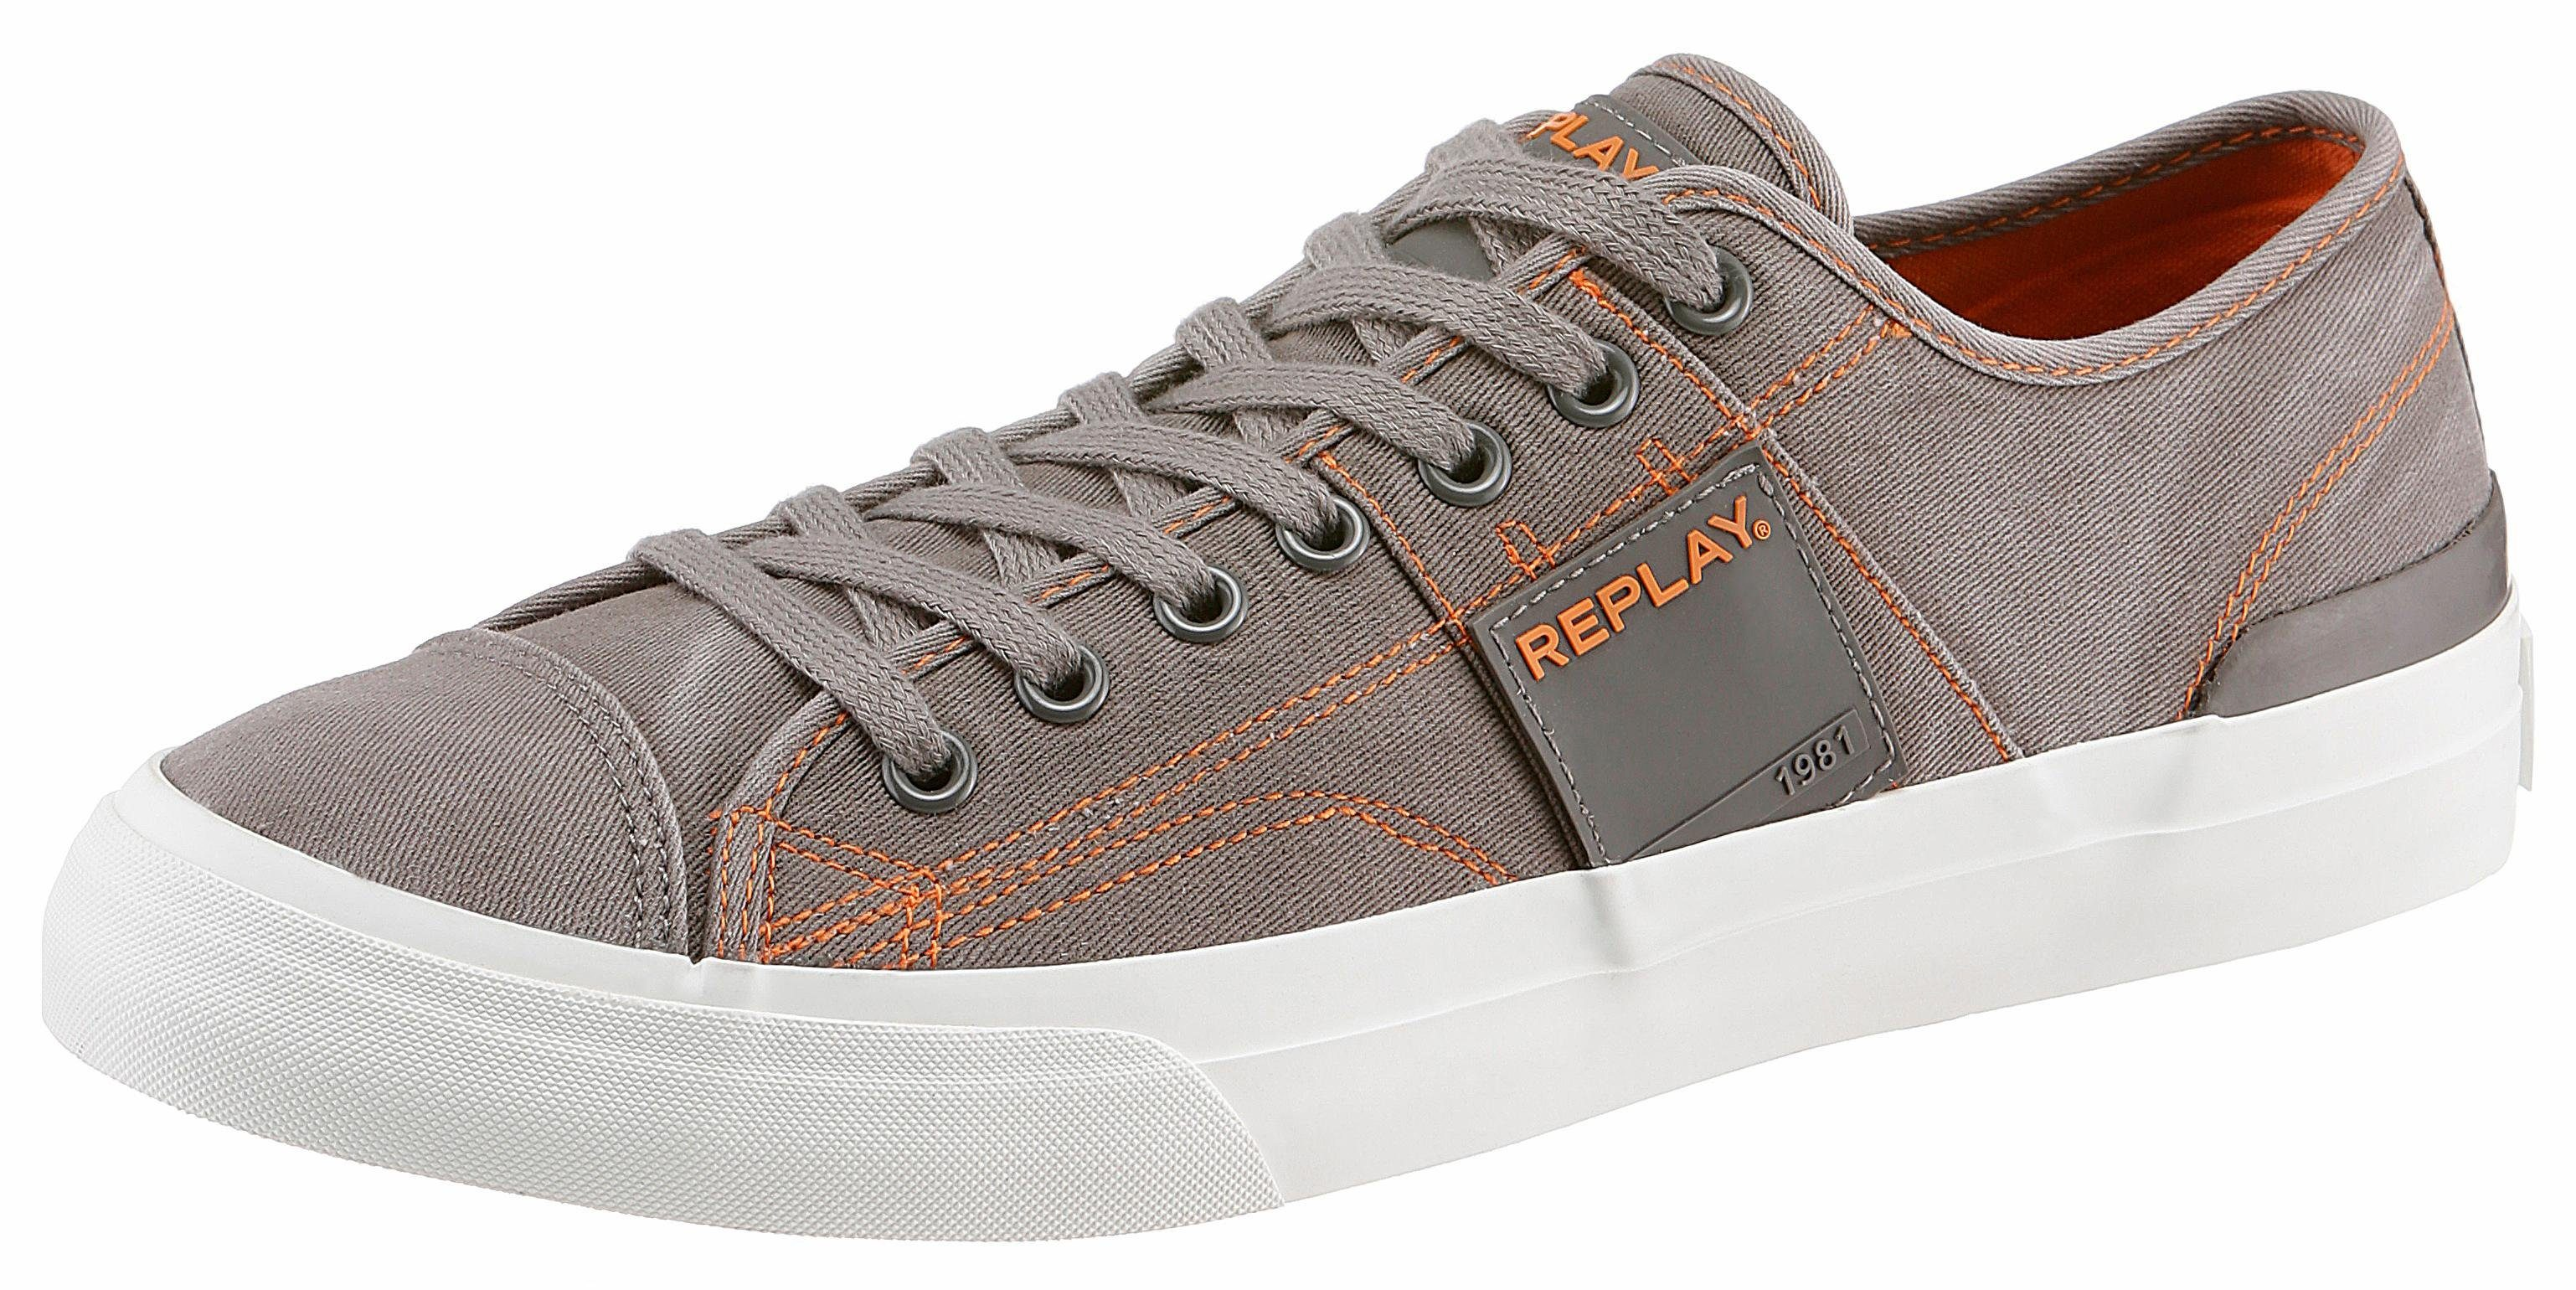 Replay Maple Sneaker, mit angesagten Kontrastnähten online kaufen  grau-orange-used